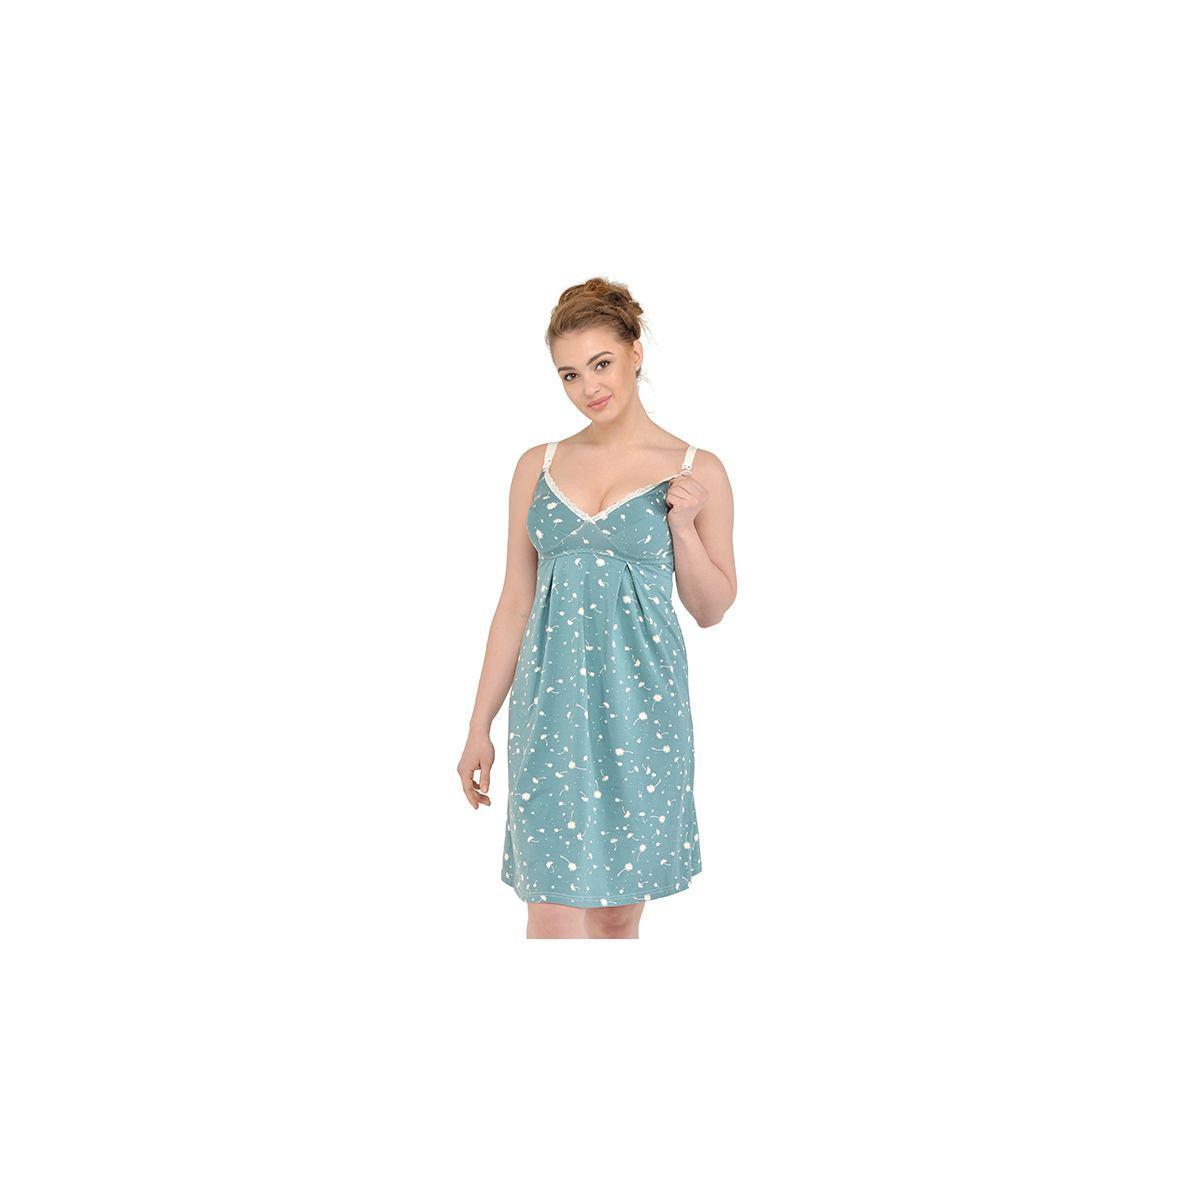 Ночная рубашка Mint Мамин Дом 24168